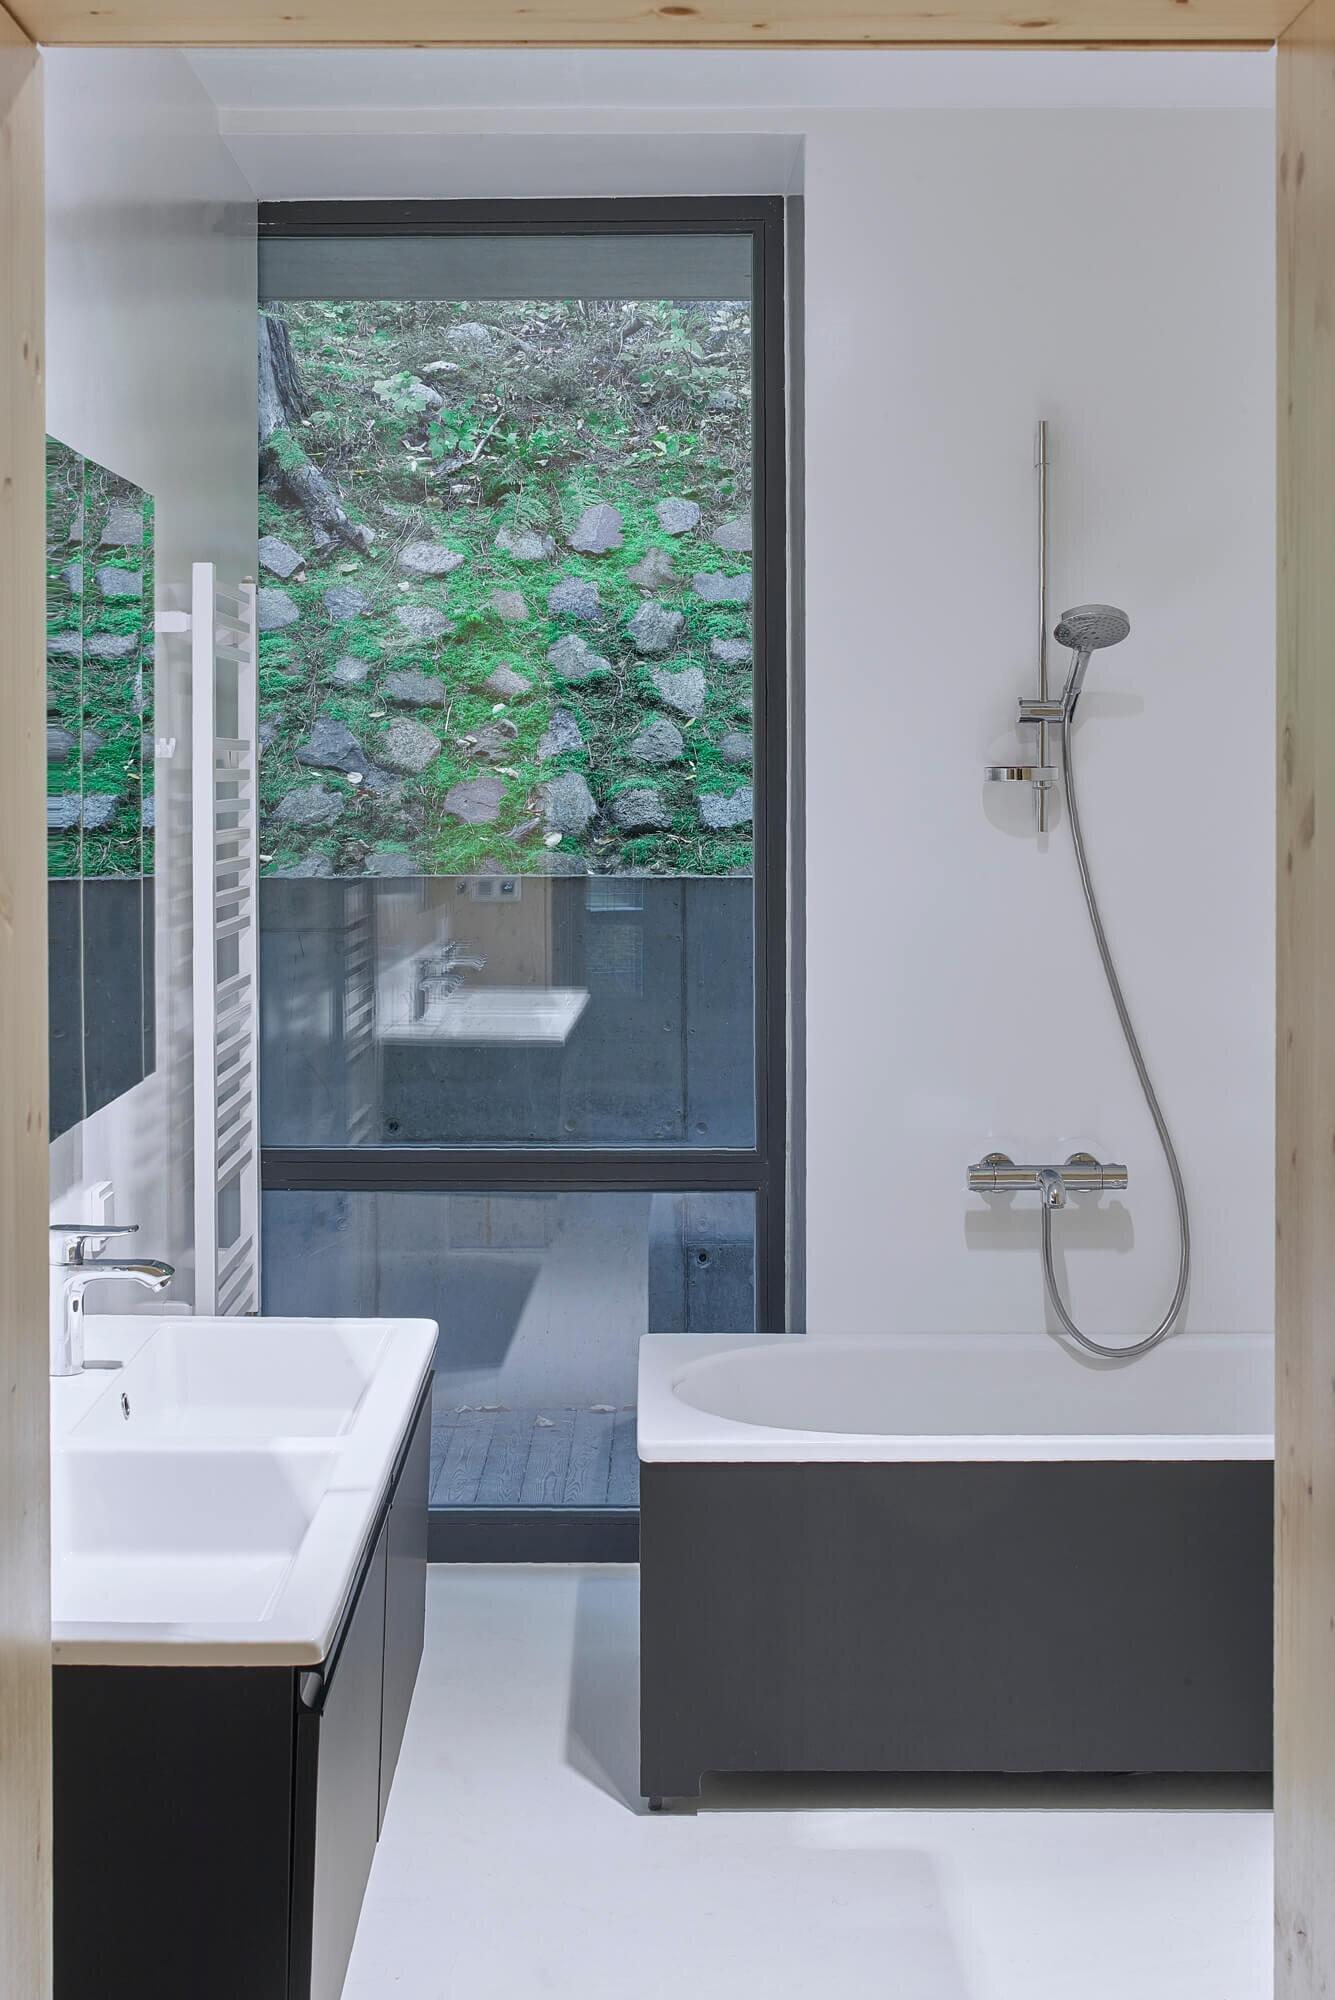 A-House-in-Rasu-Namai-Inblum-Architects-Lithuania-16